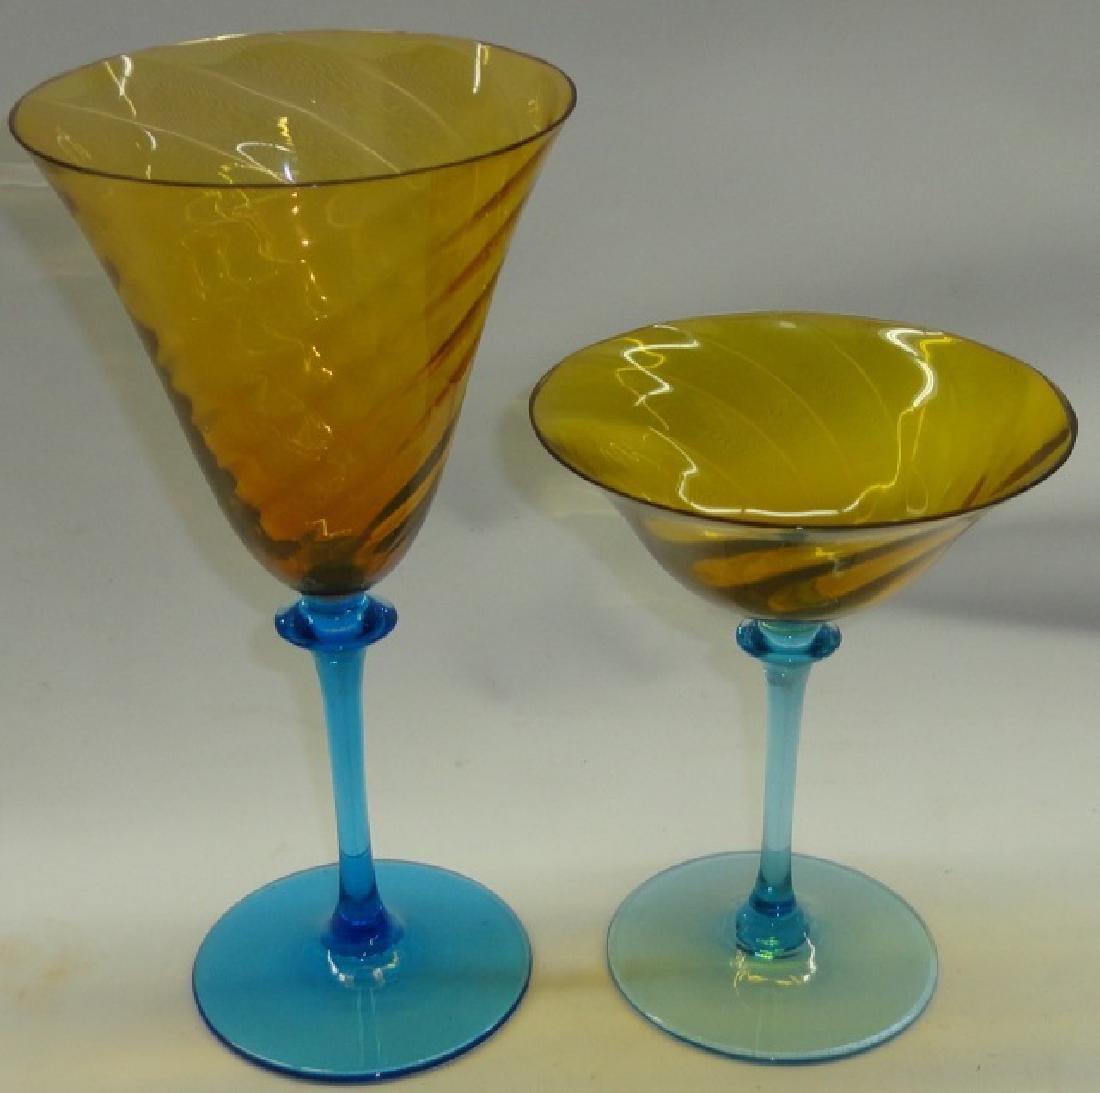 *8 PIECES OF ART GLASS STEMWARE